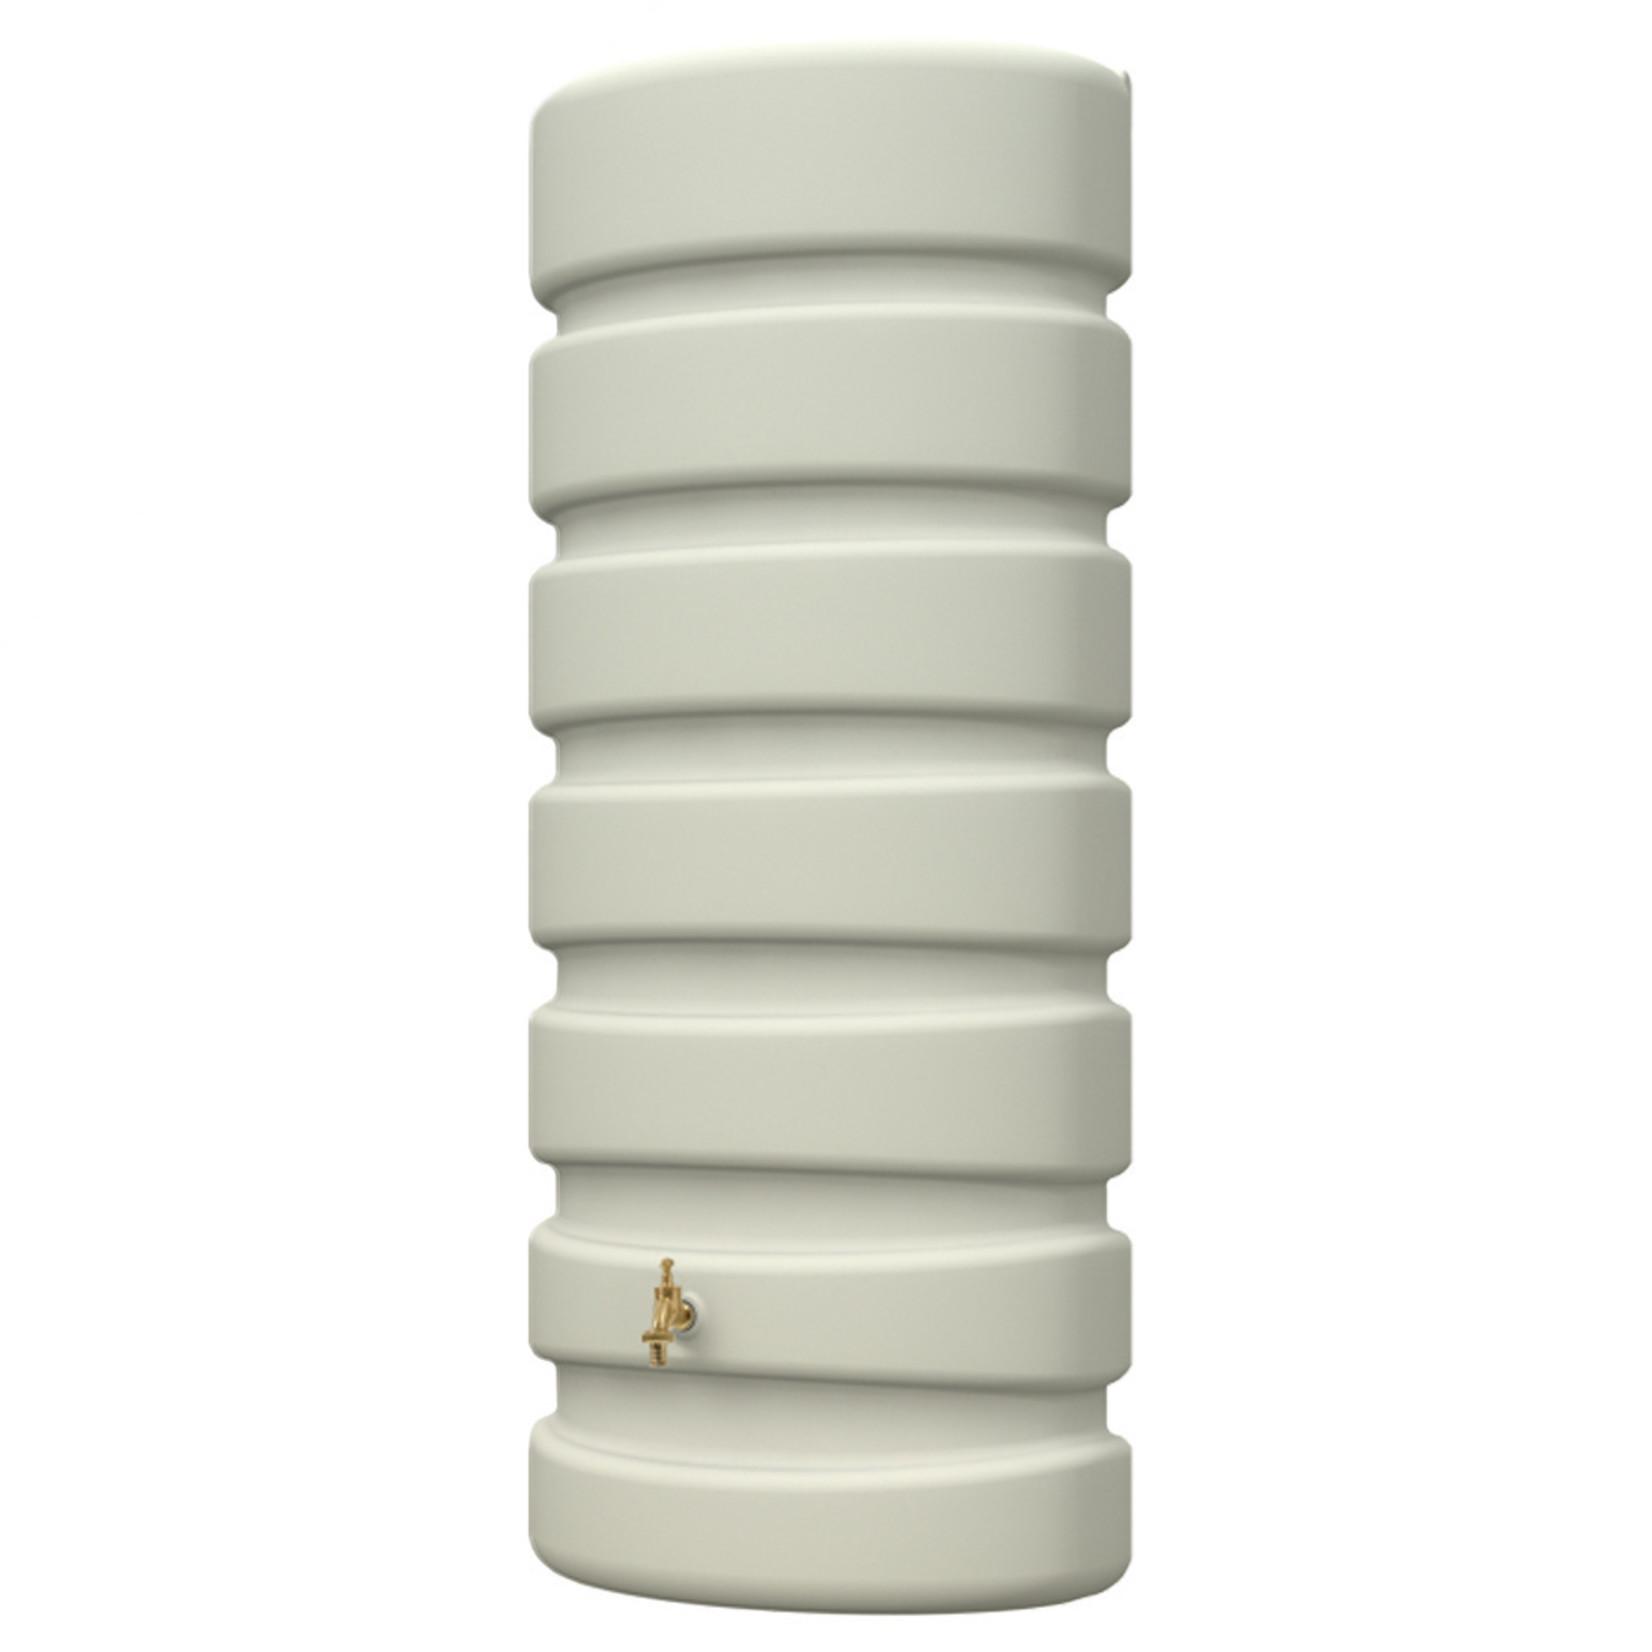 Garantia CLASSIC ton 650 ltr beige